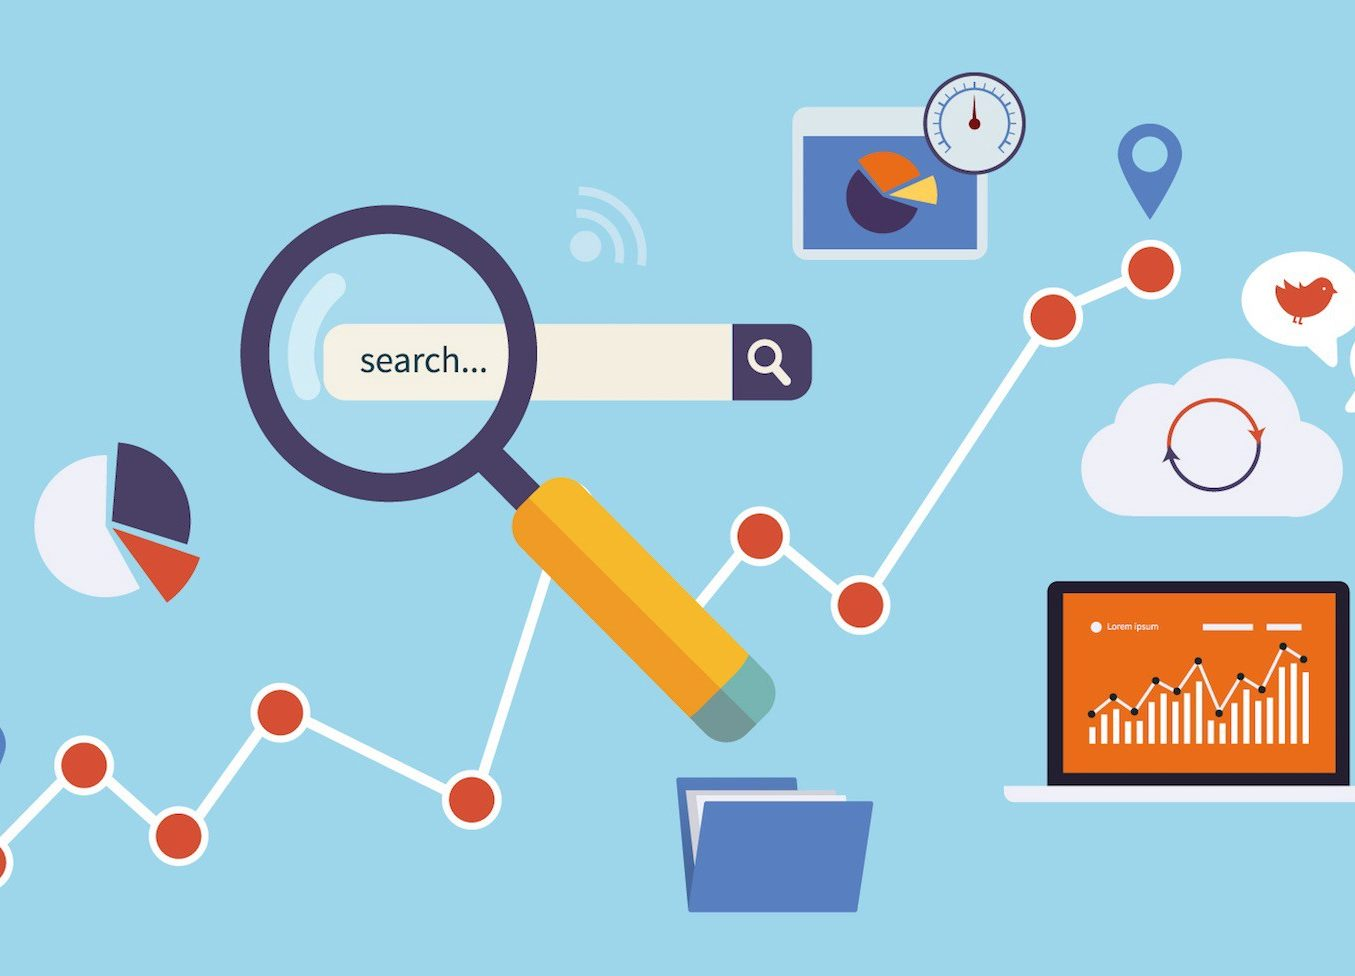 8 técnicas de SEO imprescindibles para duplicar tu tráfico de búsqueda